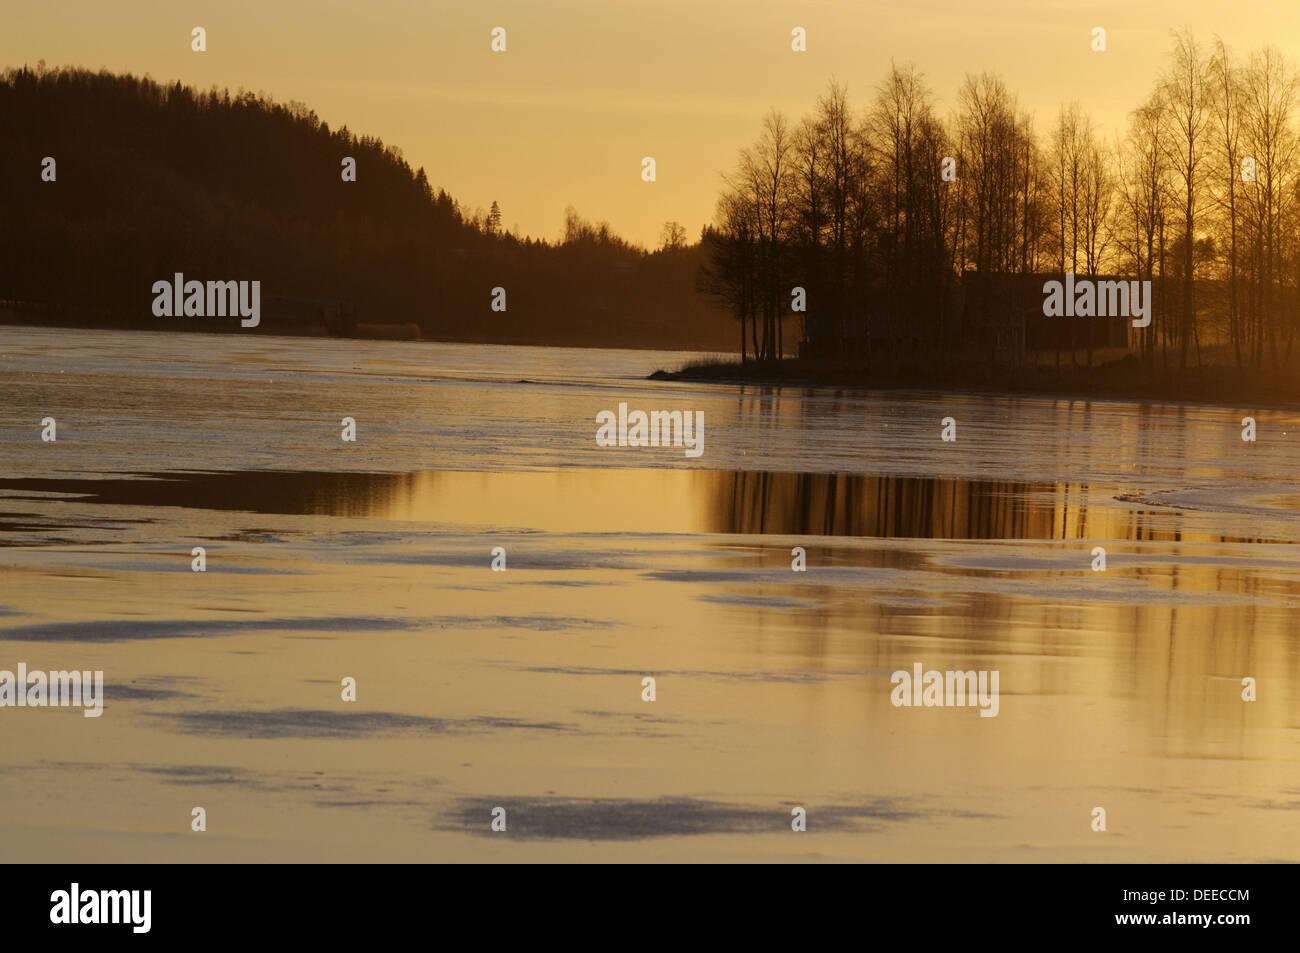 The sky at sunset is refected on thin ice on a lake near Nordingrå. High Coast / Höga Kusten, Västernorrland, Norrland, Sweden, - Stock Image